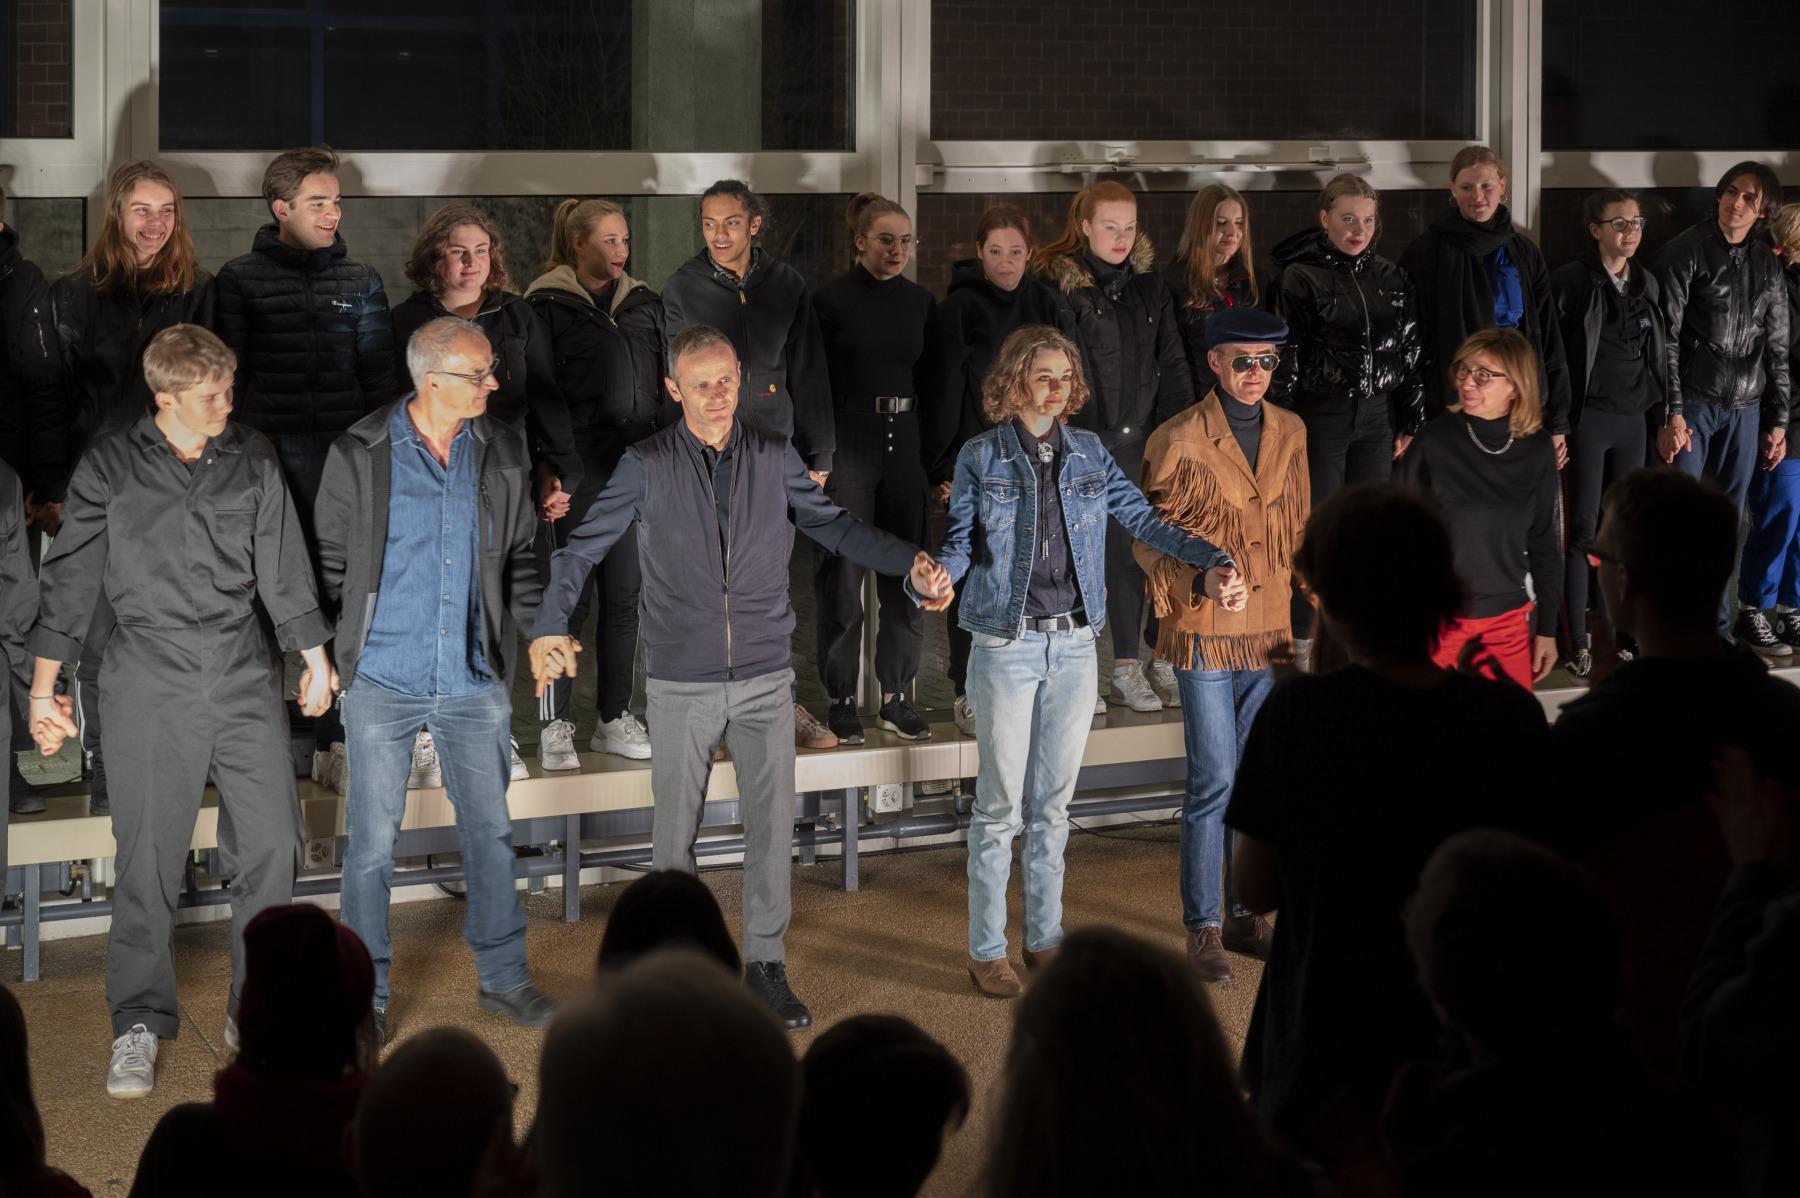 DEADNAME - Theatergruppe AUJA!